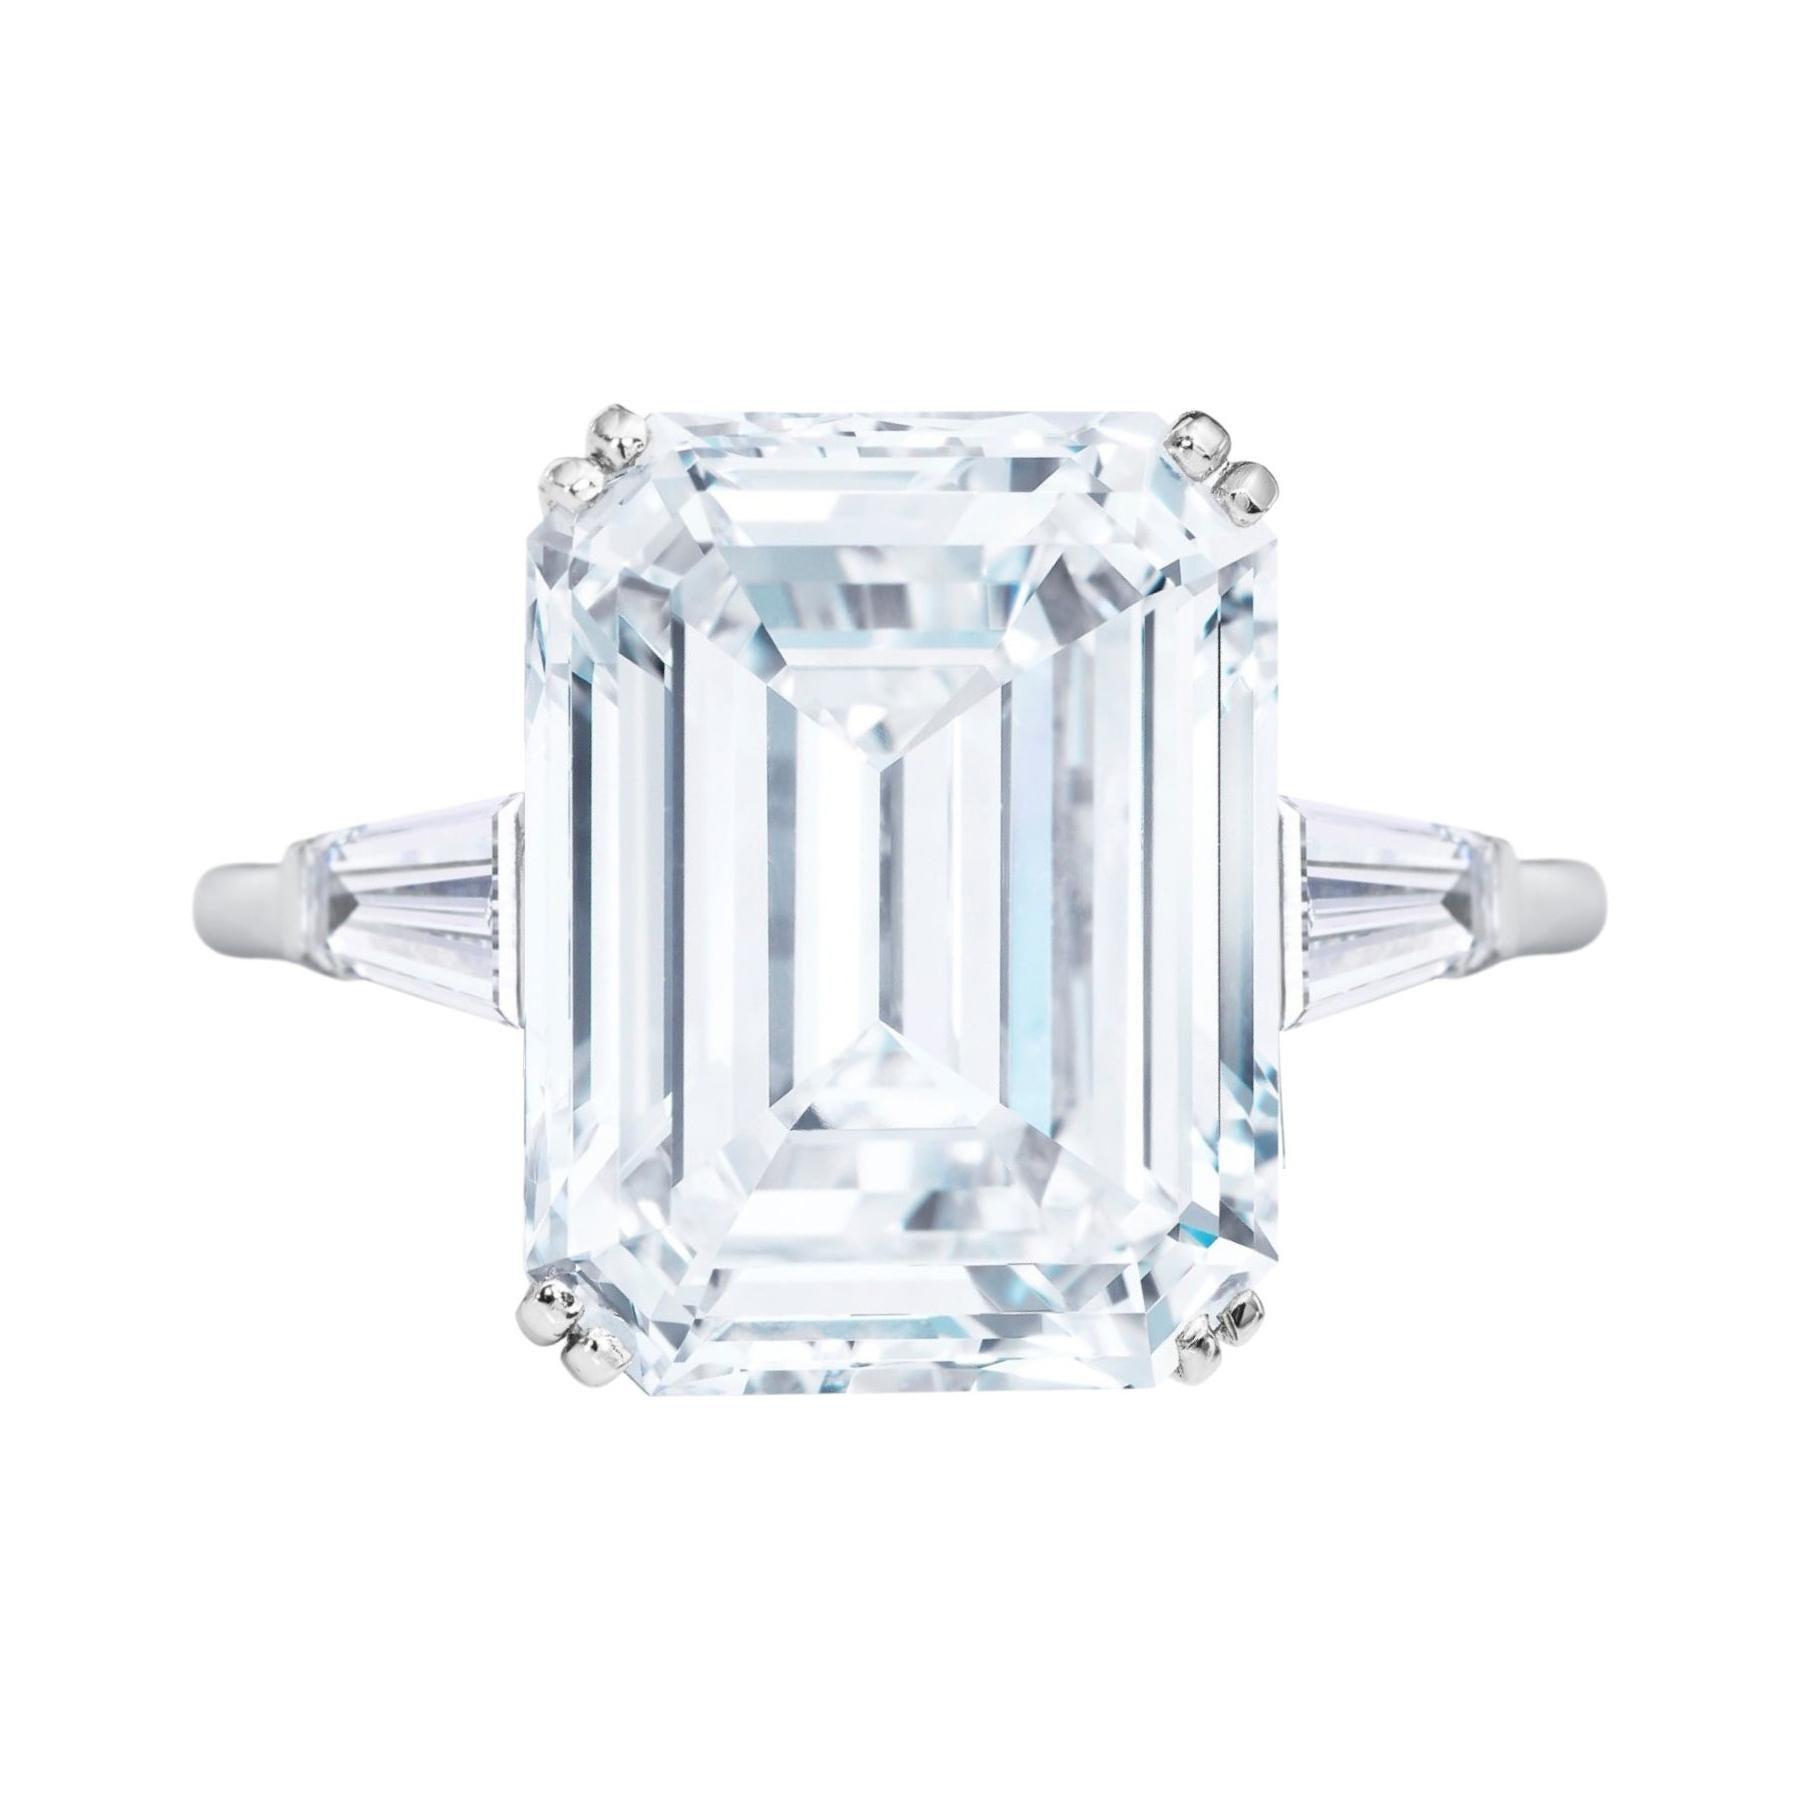 GIA Certified 5 Carat Emerald Cut Diamond Platinum Ring